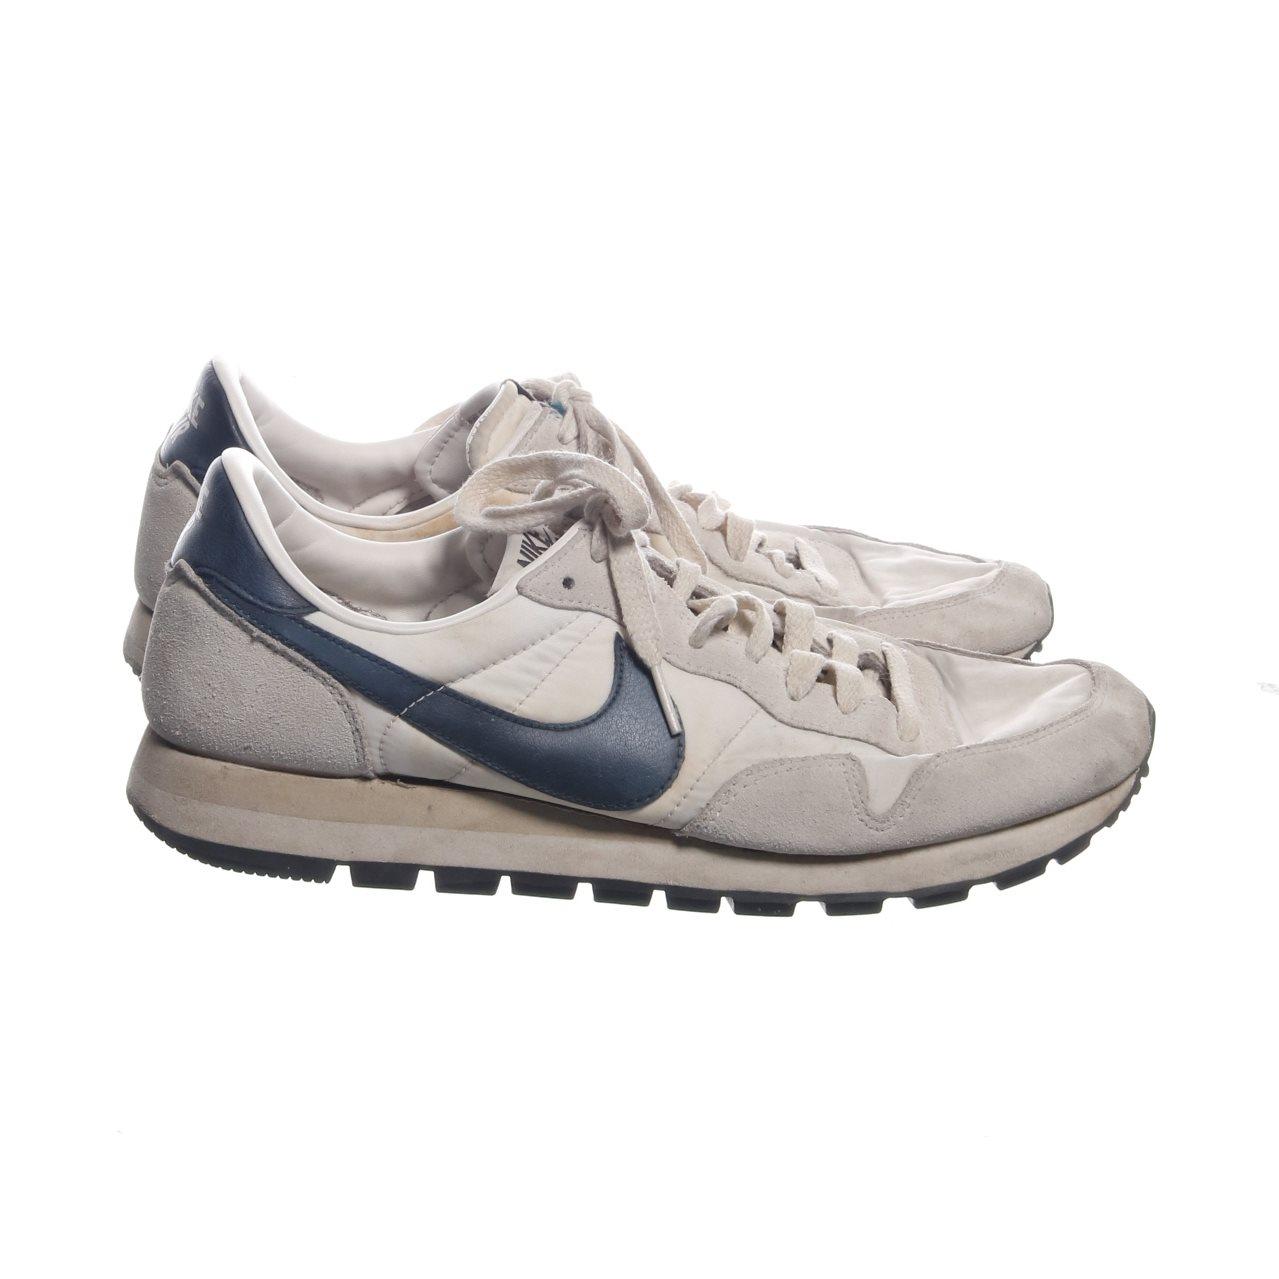 quality design 29f9f 7ae19 nike air, Sneakers, Strl  44, Vit Mörkblå